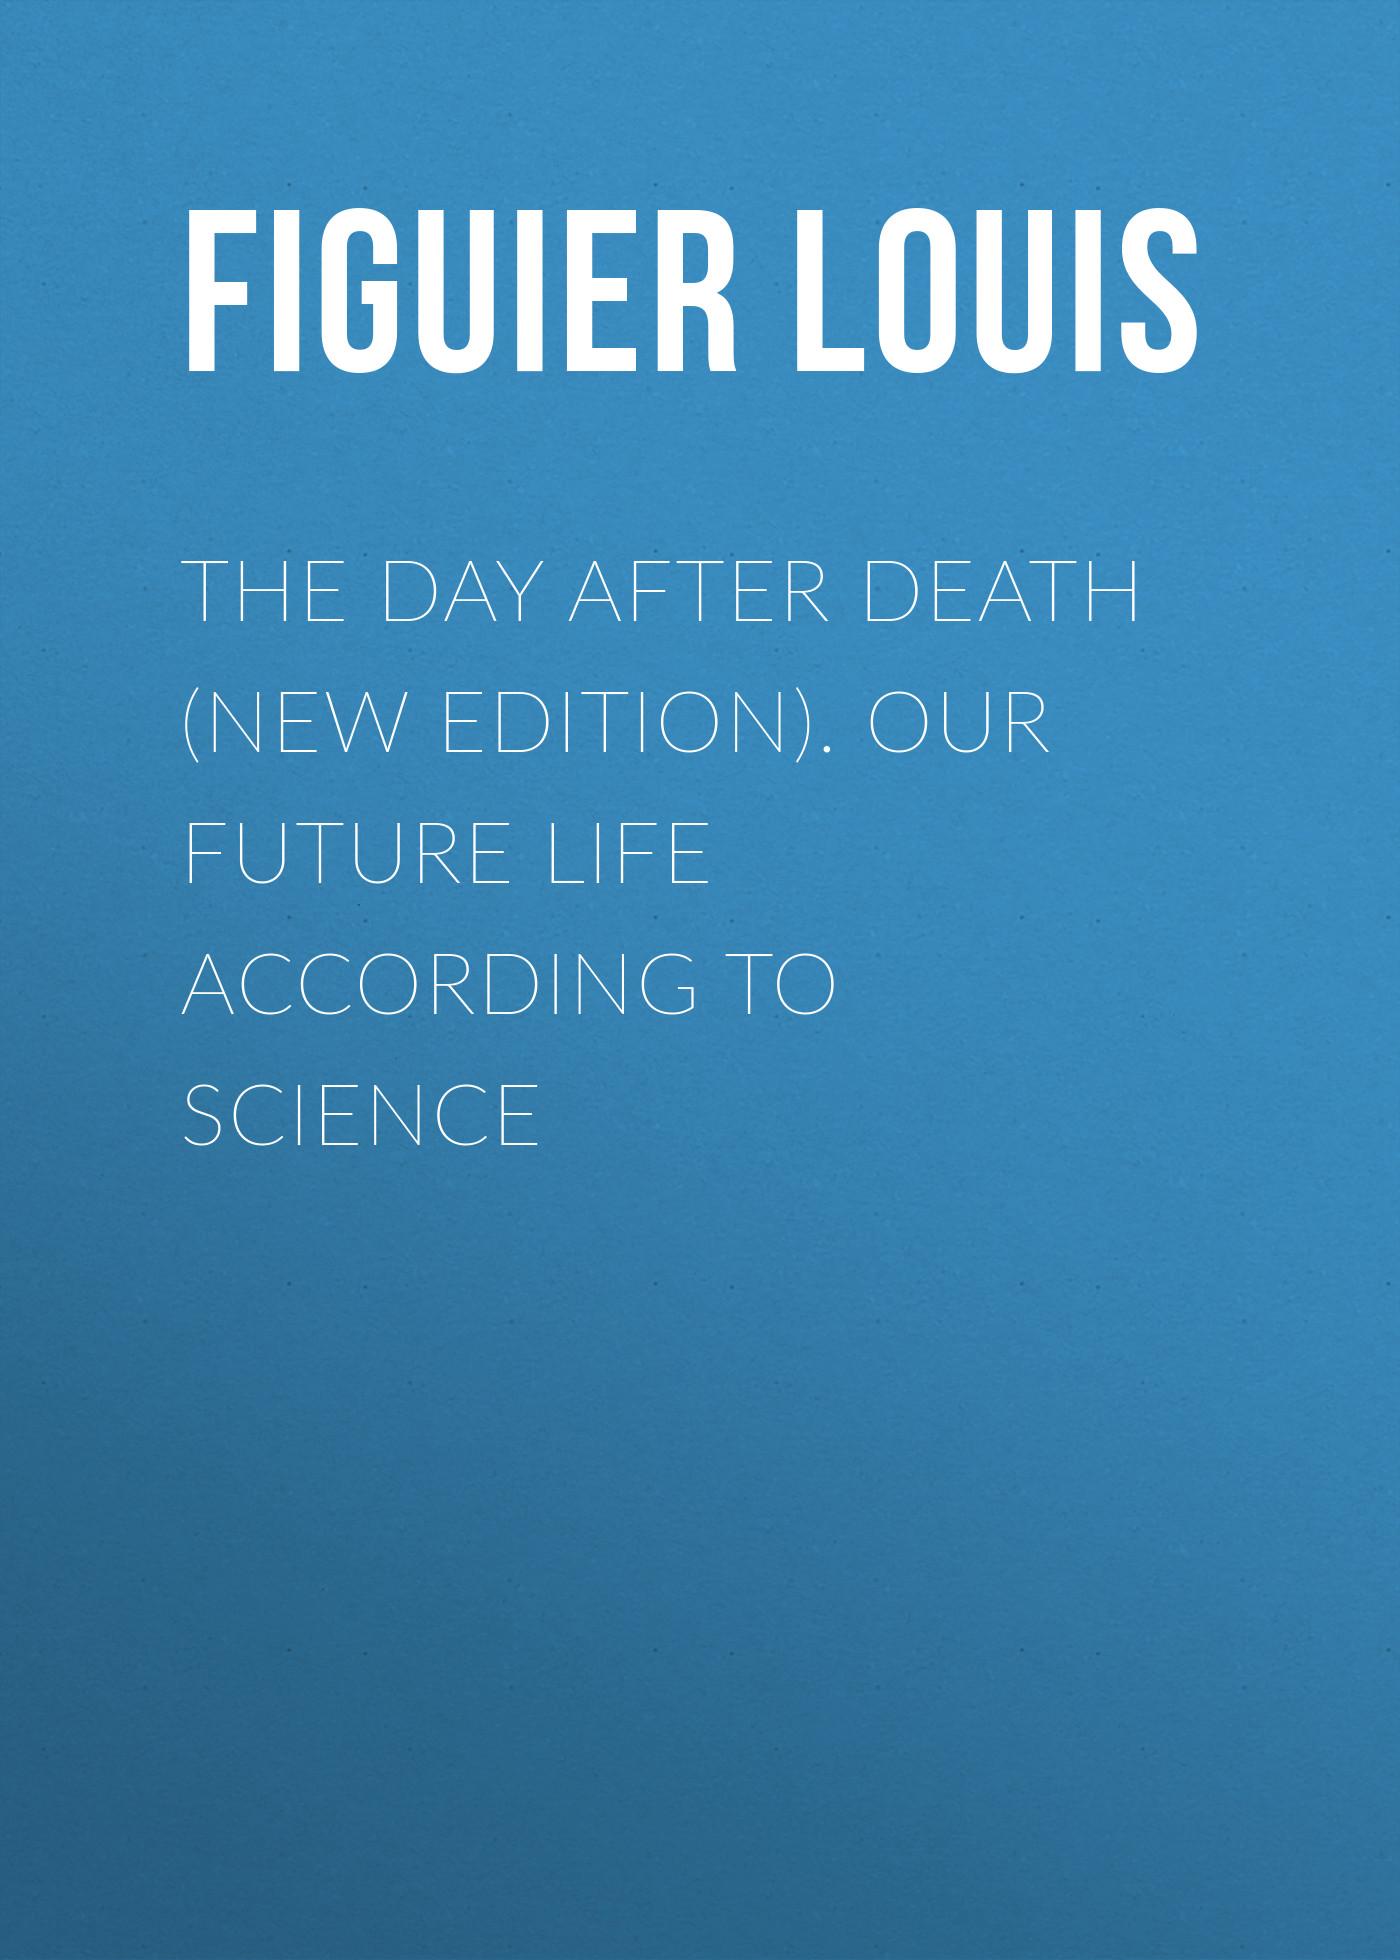 Life & Death According to Robert Lanza